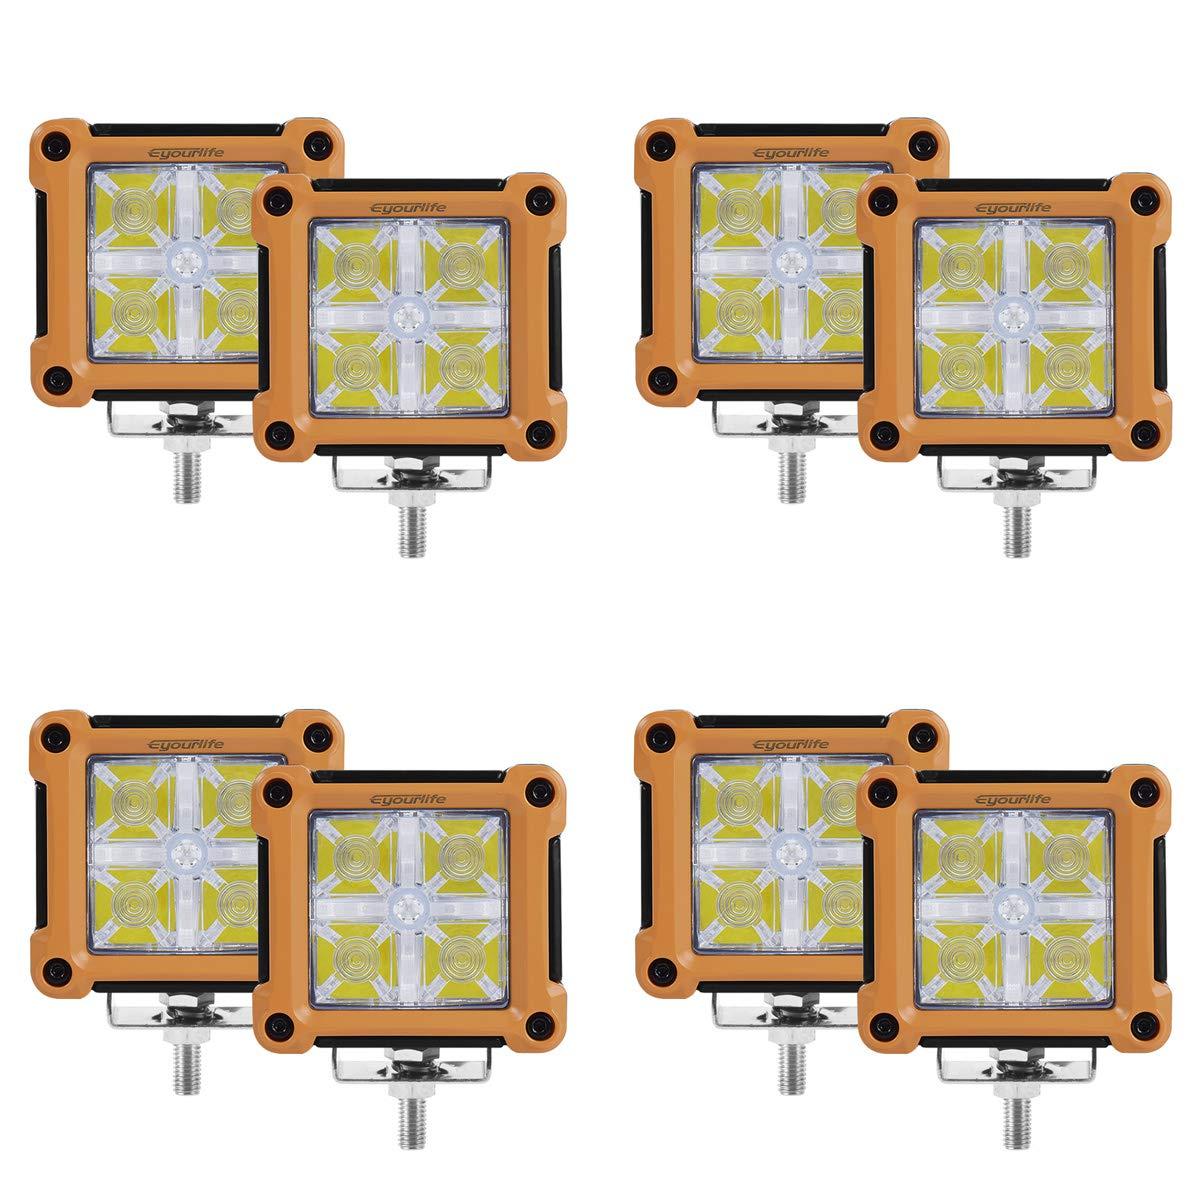 Blue Light Eyourlife Day Time running Lights 3.2 inch 20W Led Work Light Backlight Philips High Penetration Led Bulb Pair Colorful Spotlight Fog Light Off Road SUV Driving Headlight Pods 4Pcs